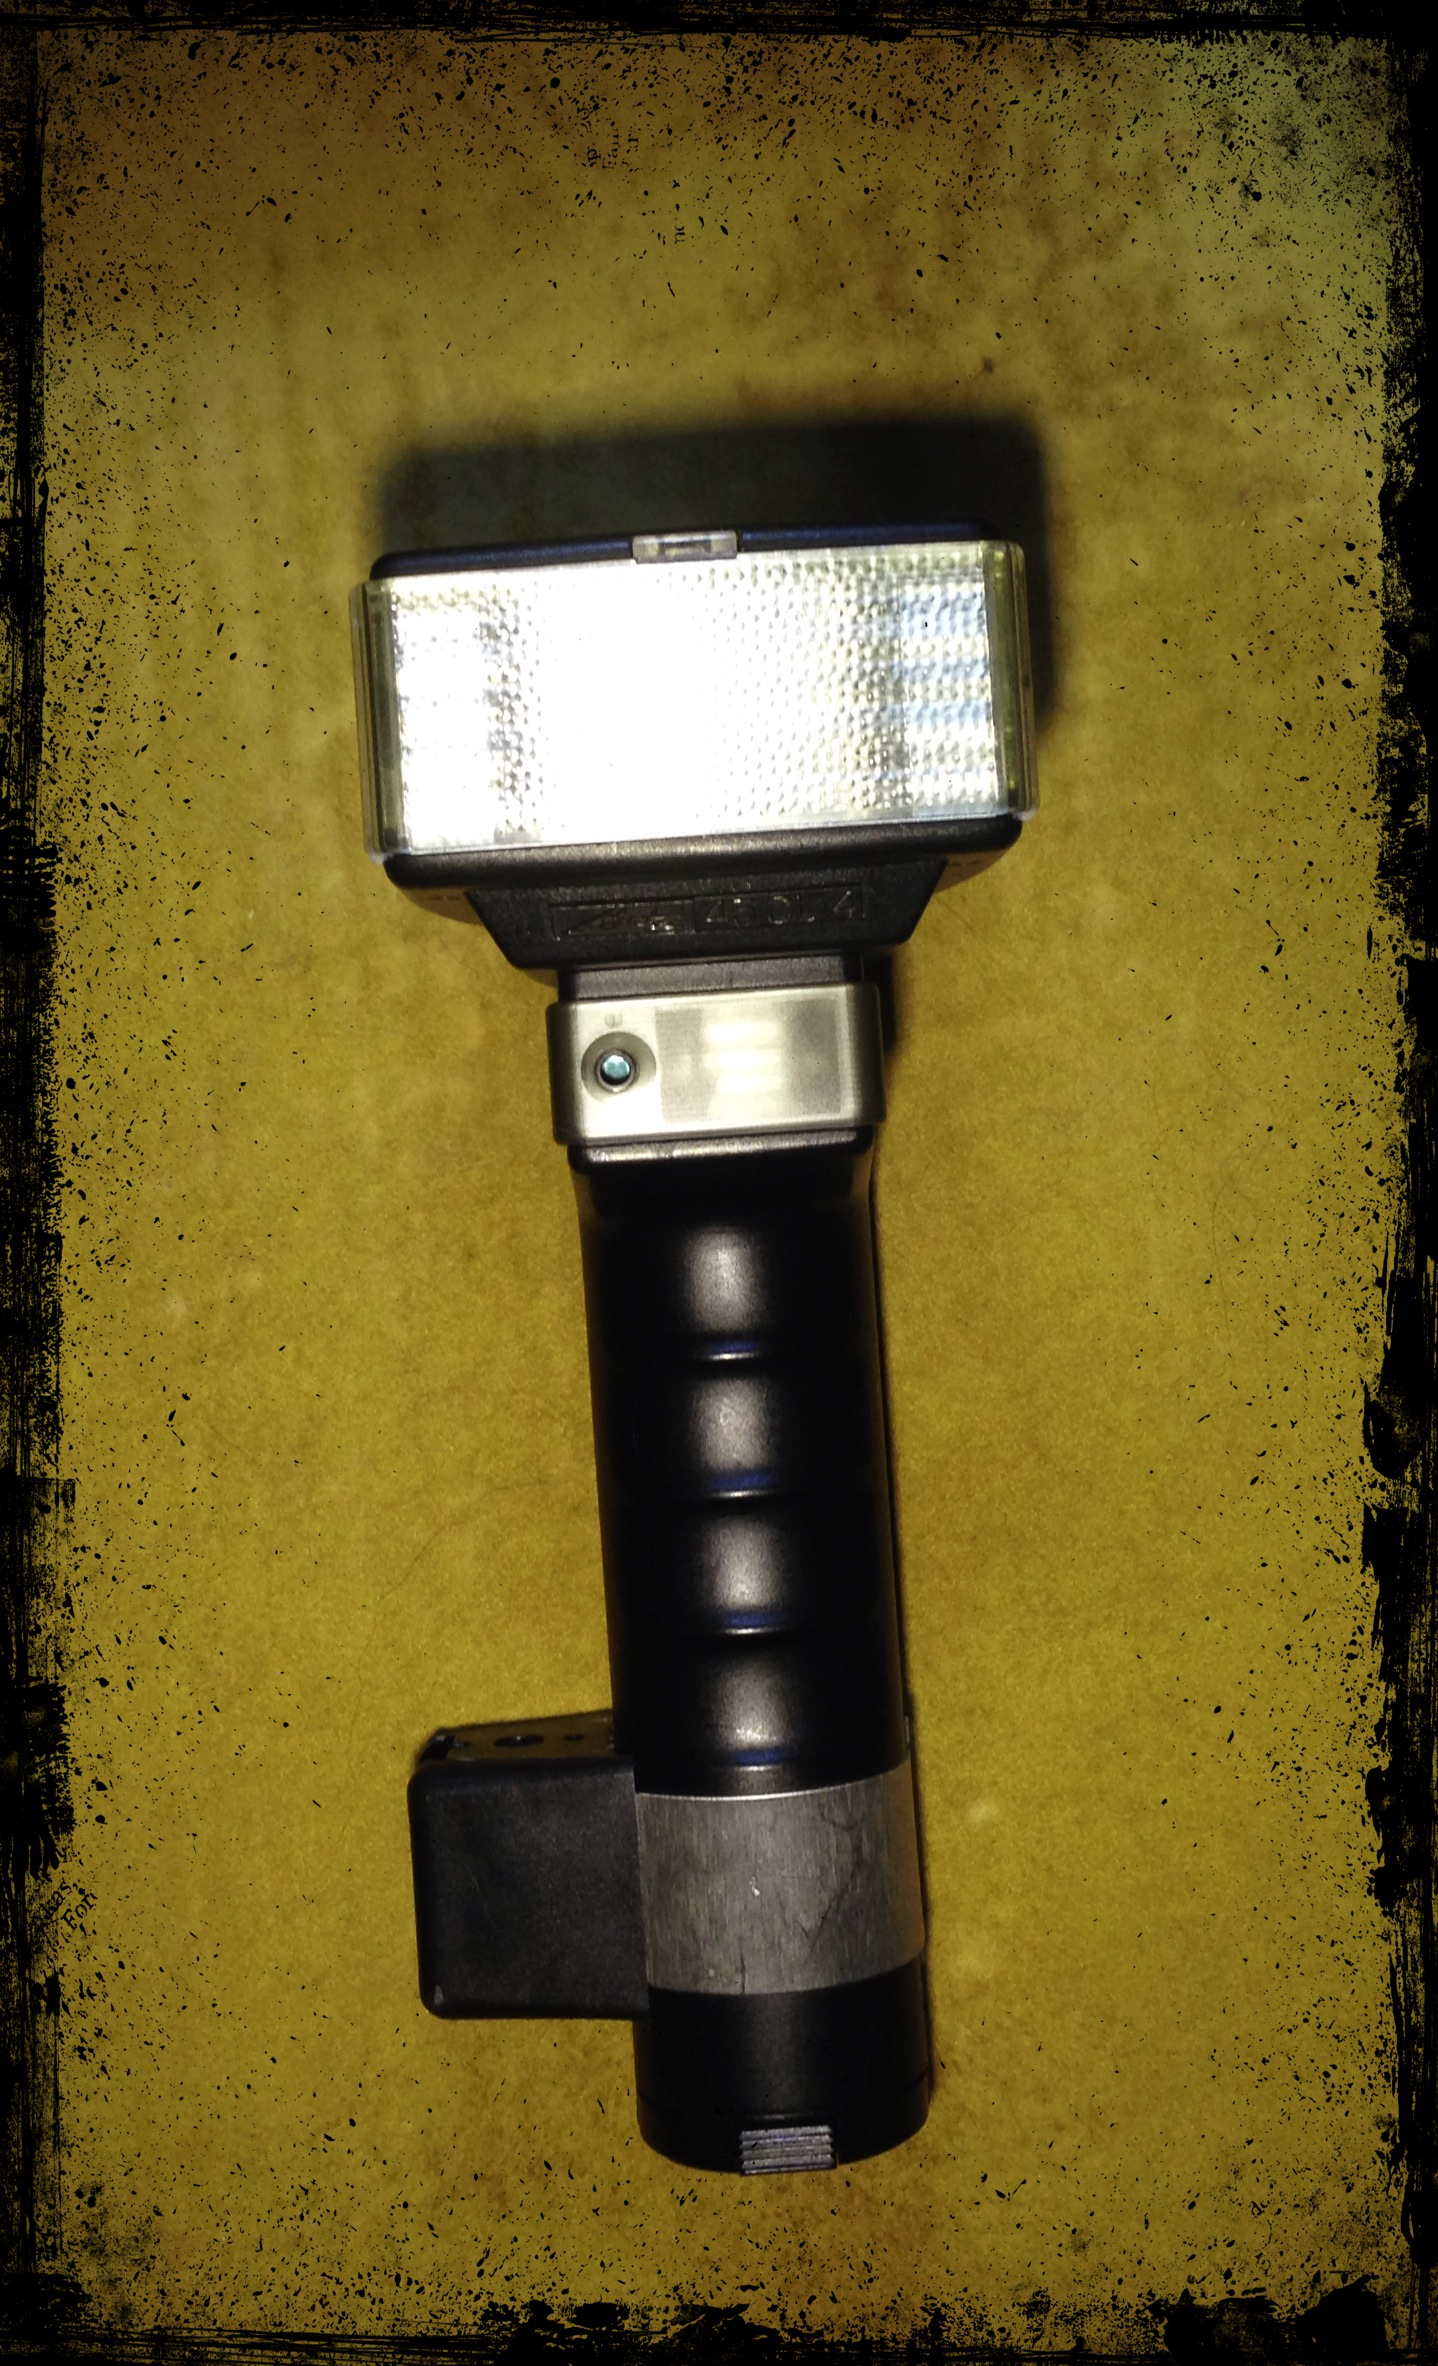 Black PocketWizard 804-414 ME1-6P Electronic Flash Cable